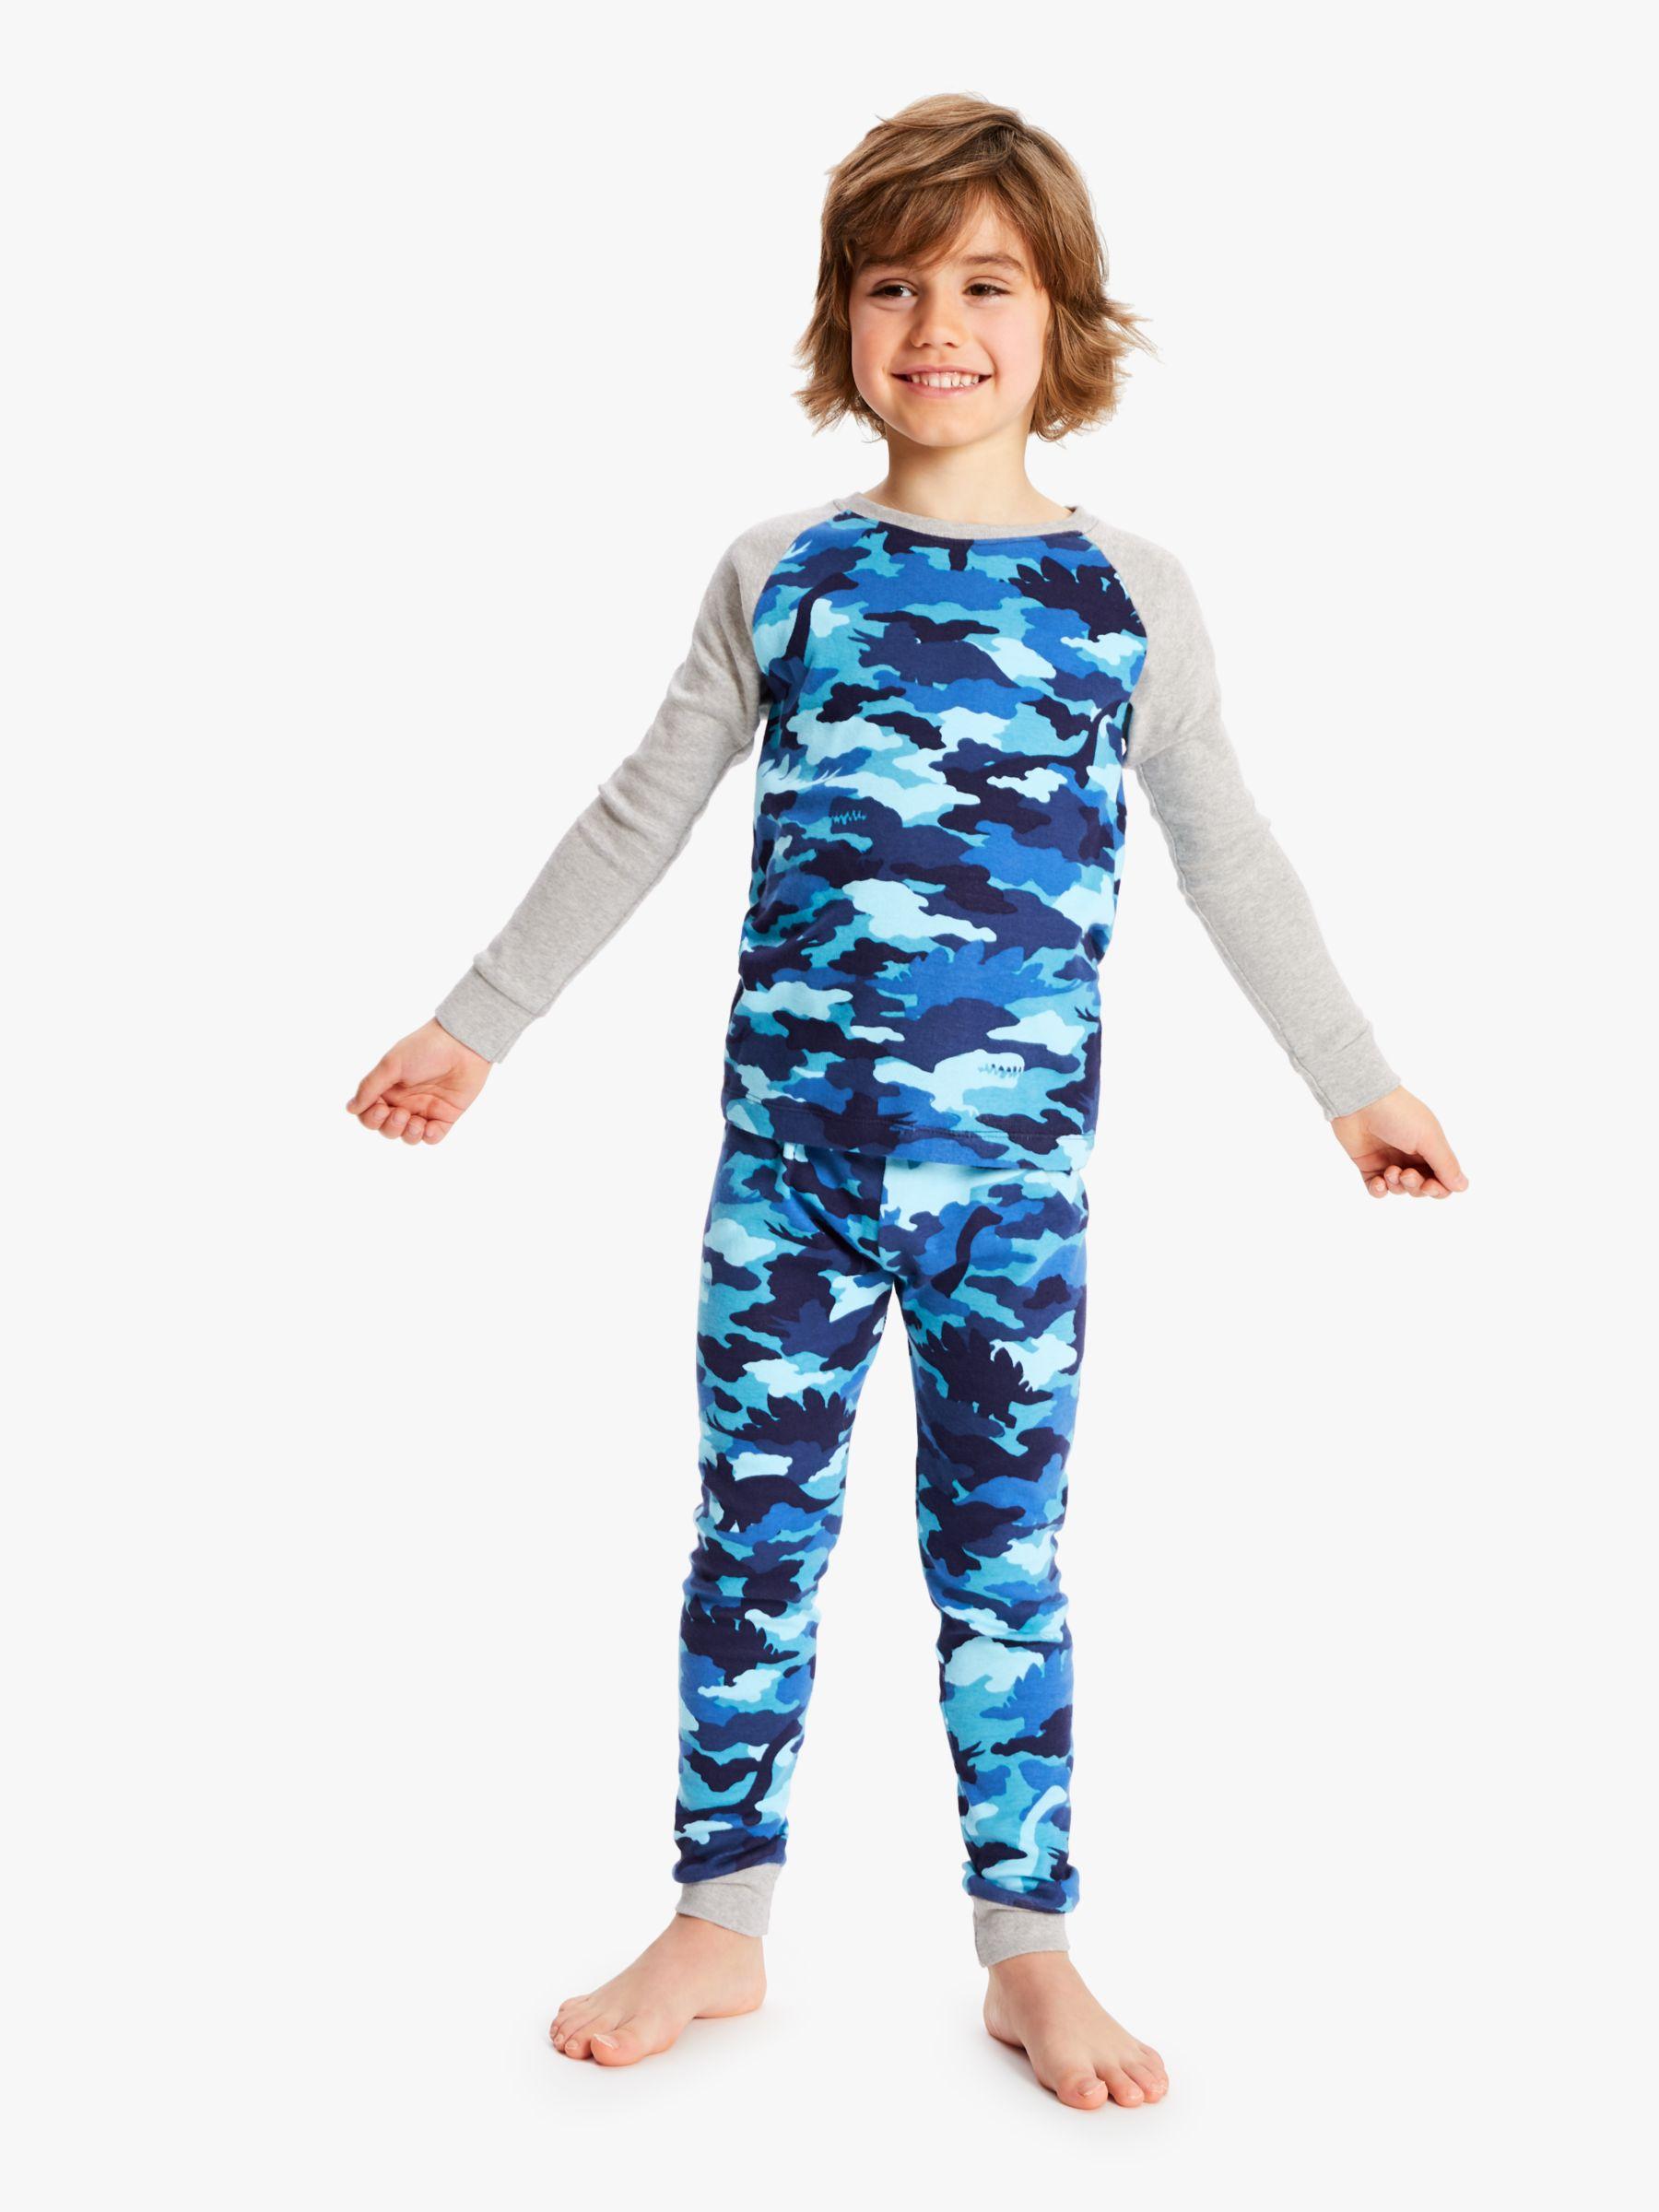 Hatley Hatley Boys' Dinosaur Camouflage Pyjamas, Blue